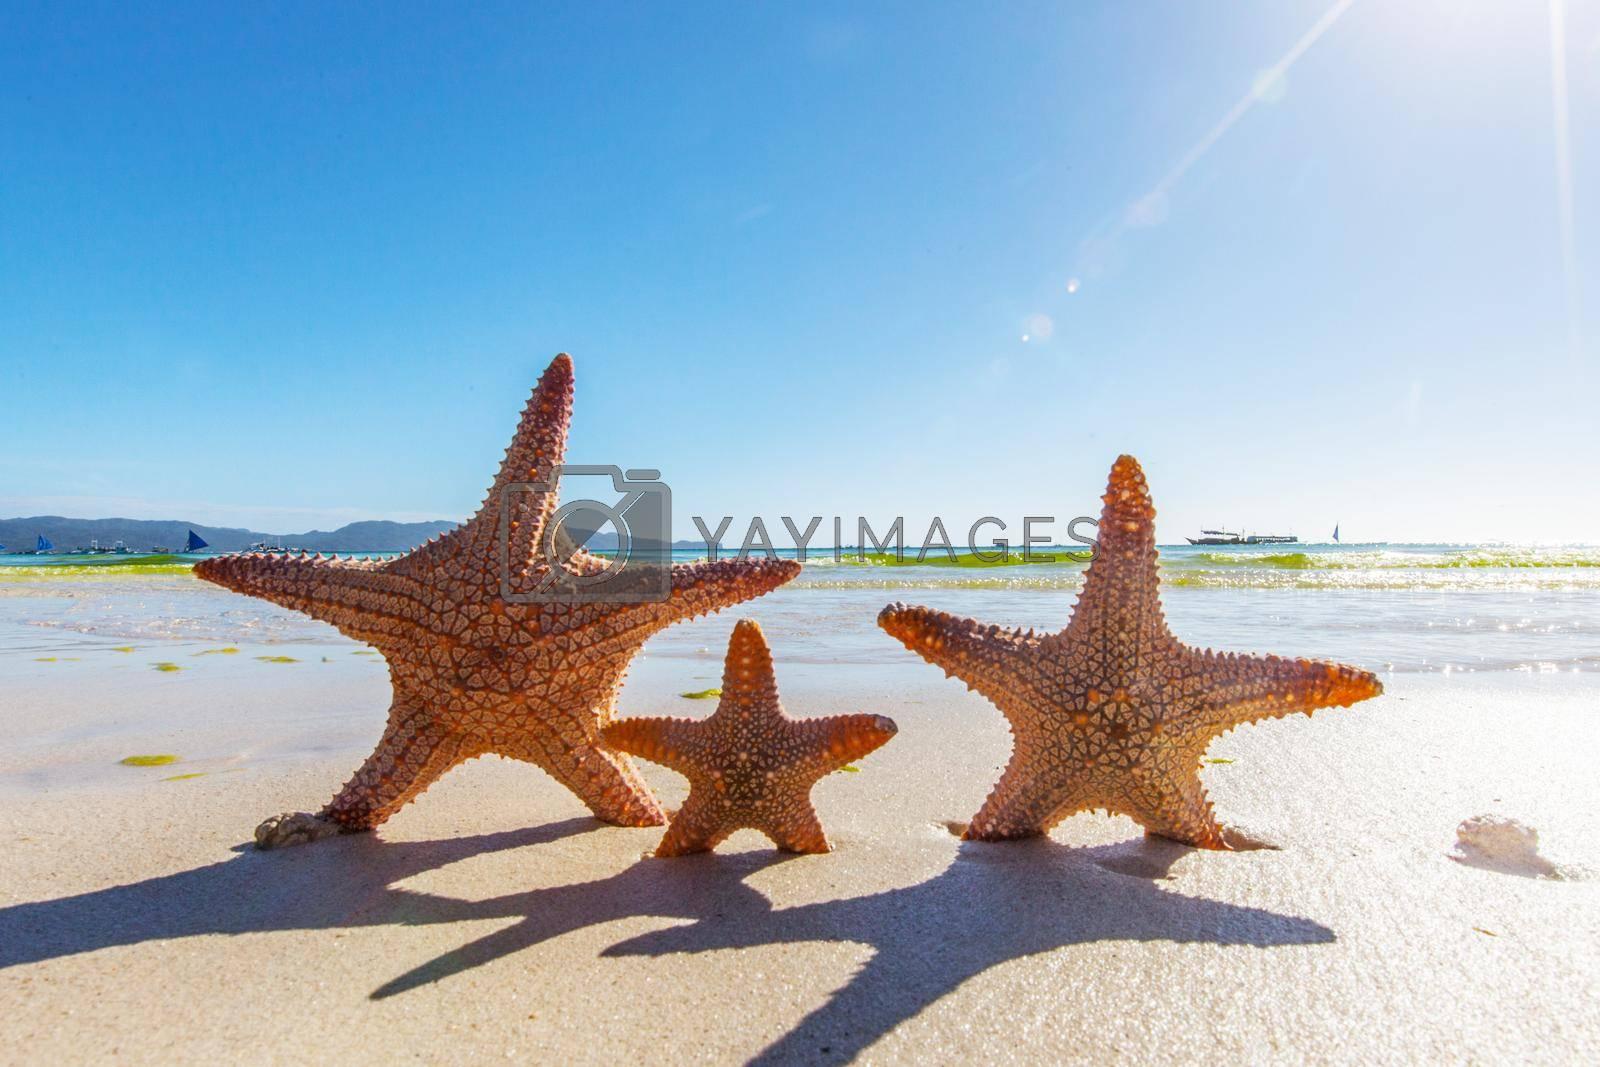 Royalty free image of Three Starfish on sandy beach by Yellowj